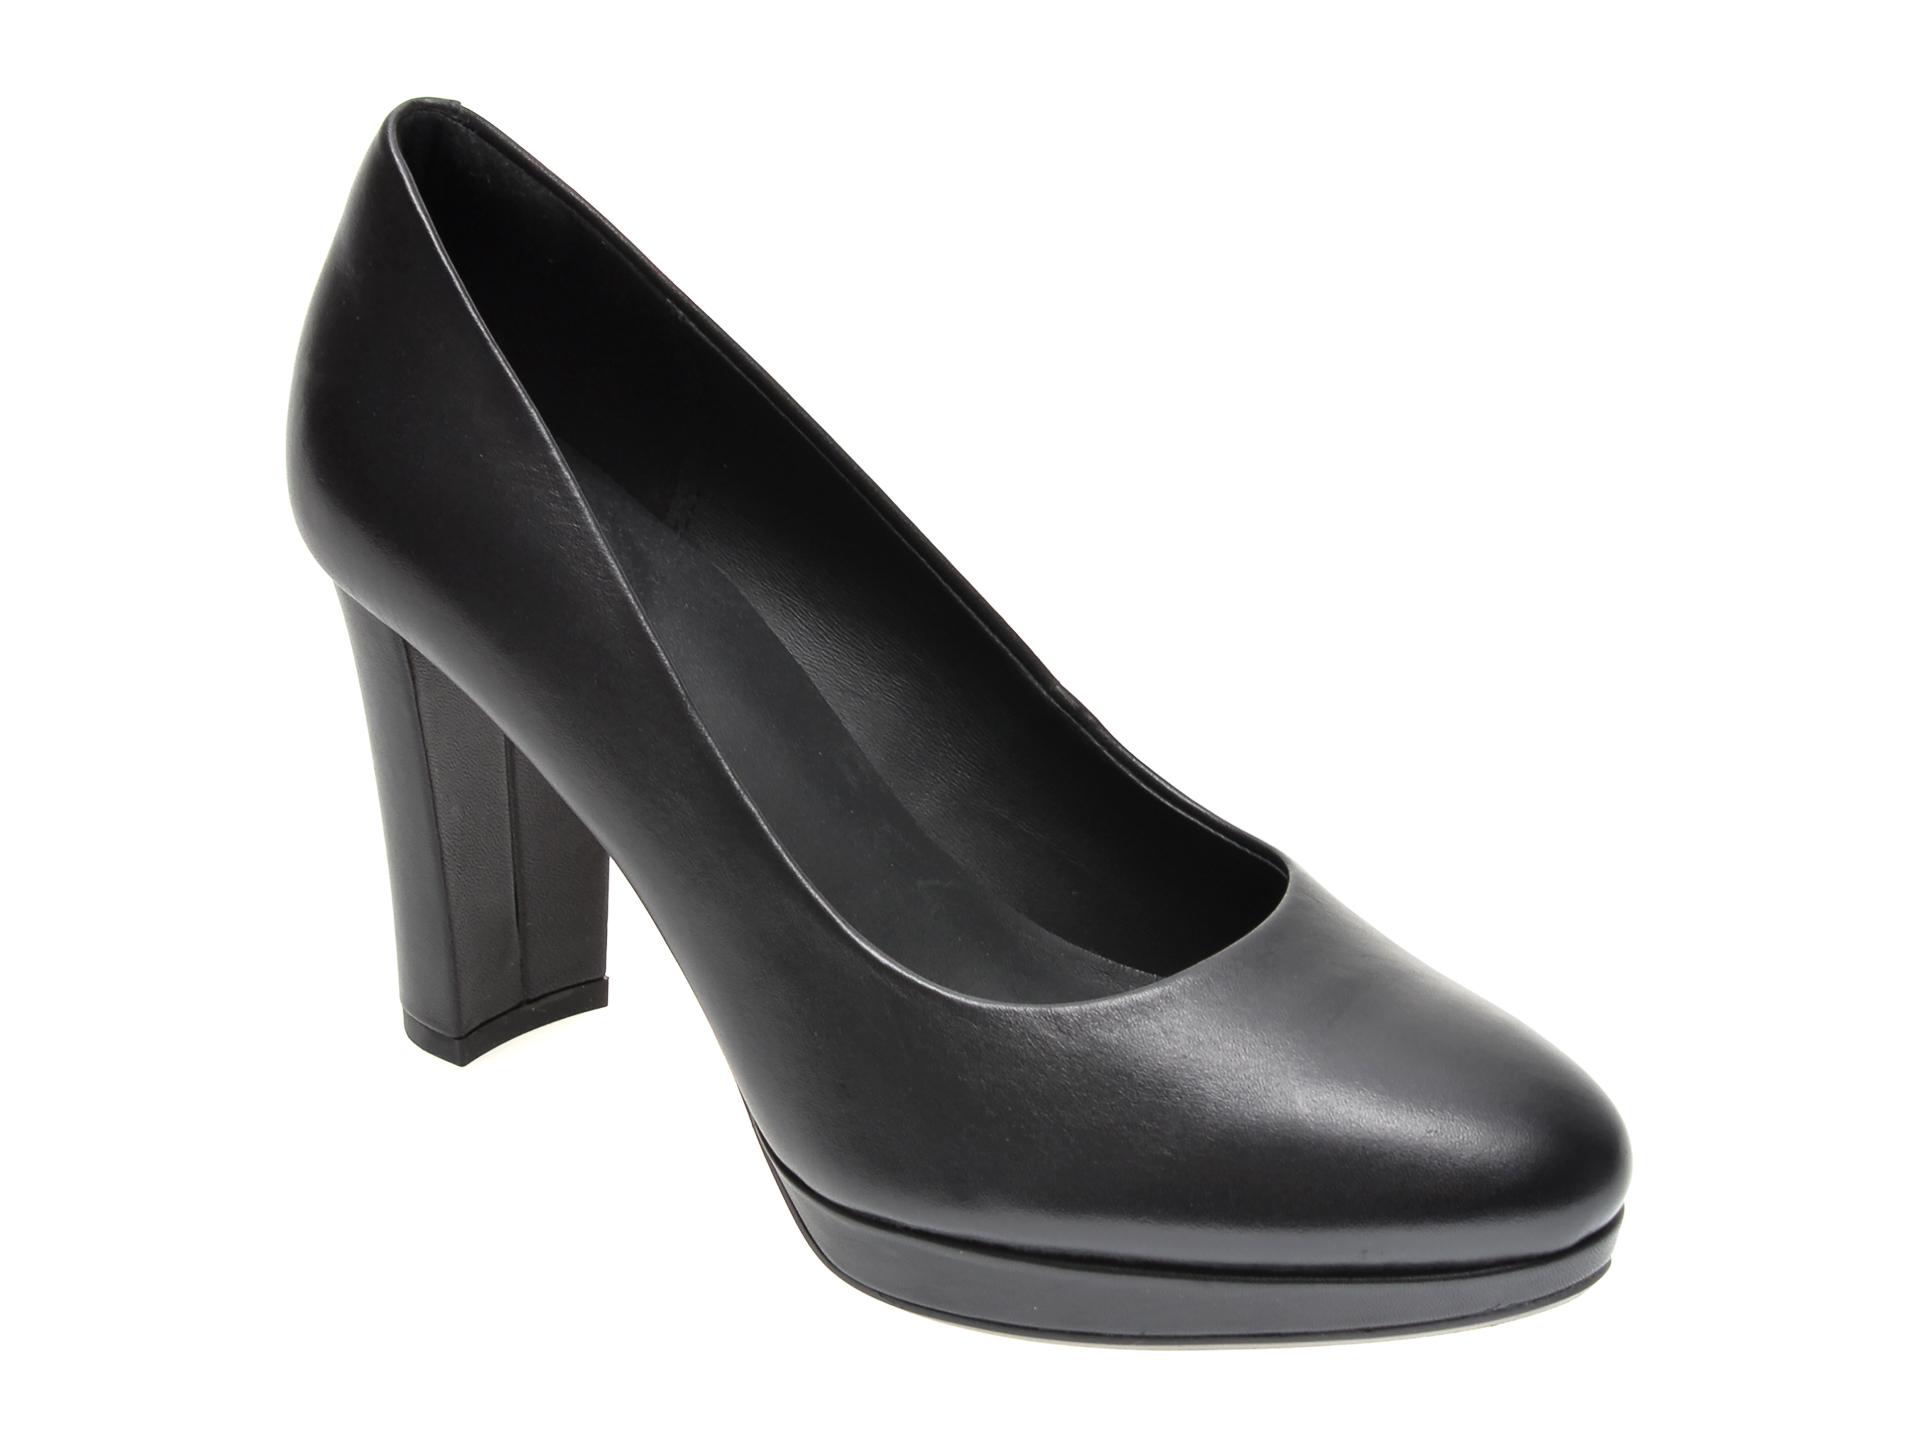 Pantofi CLARKS negri, KENDRA SIENNA, din piele naturala imagine